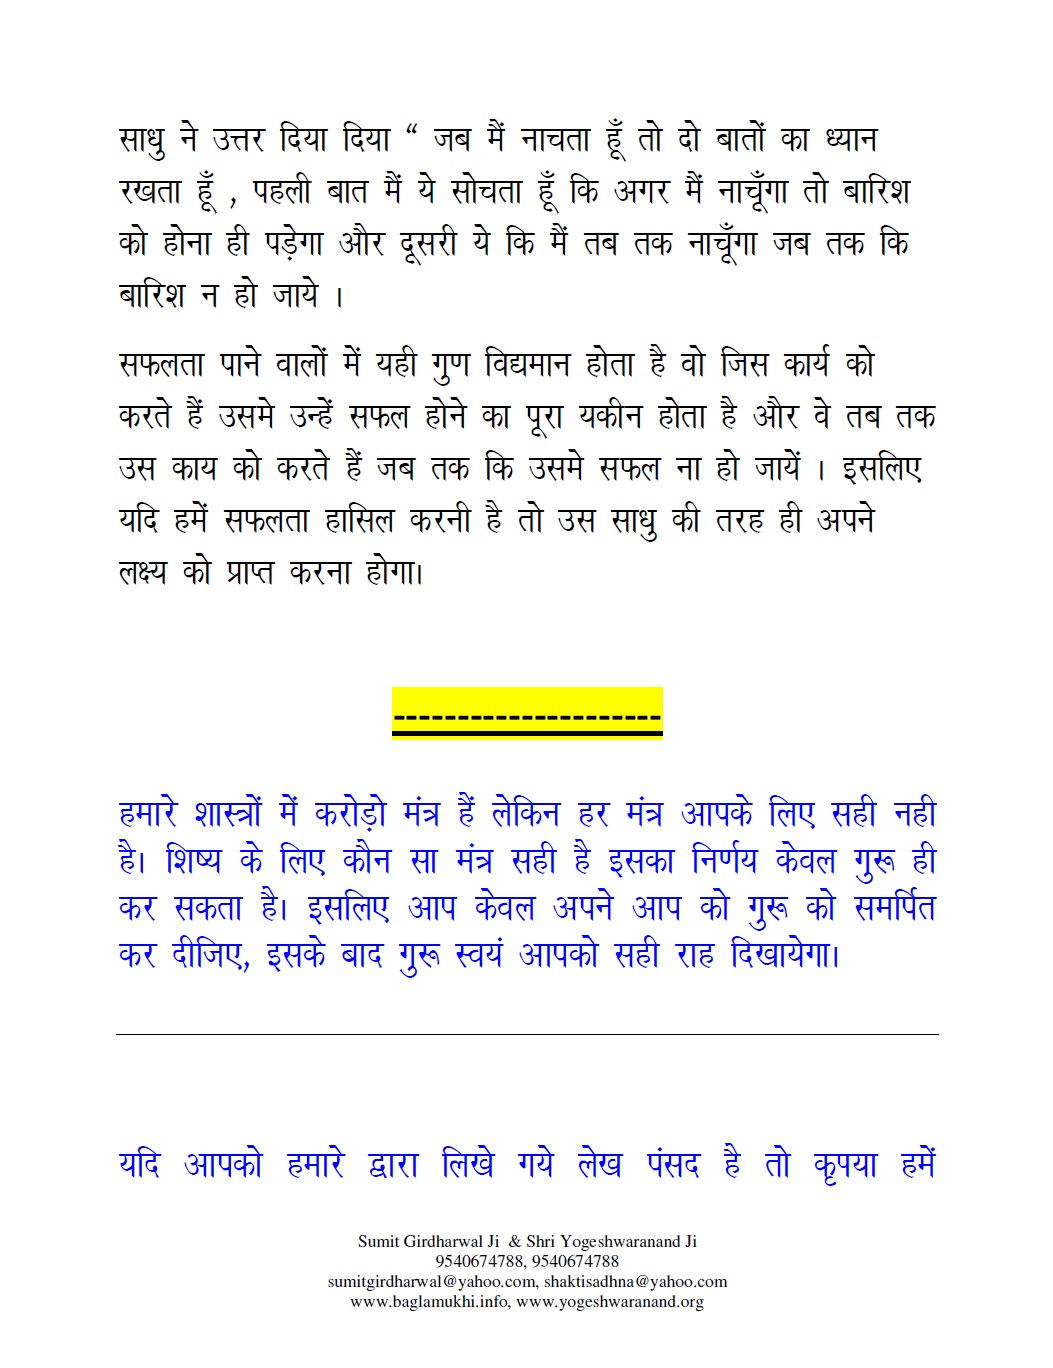 chinnamasta-mantra-sadhana-evam-siddhi-i